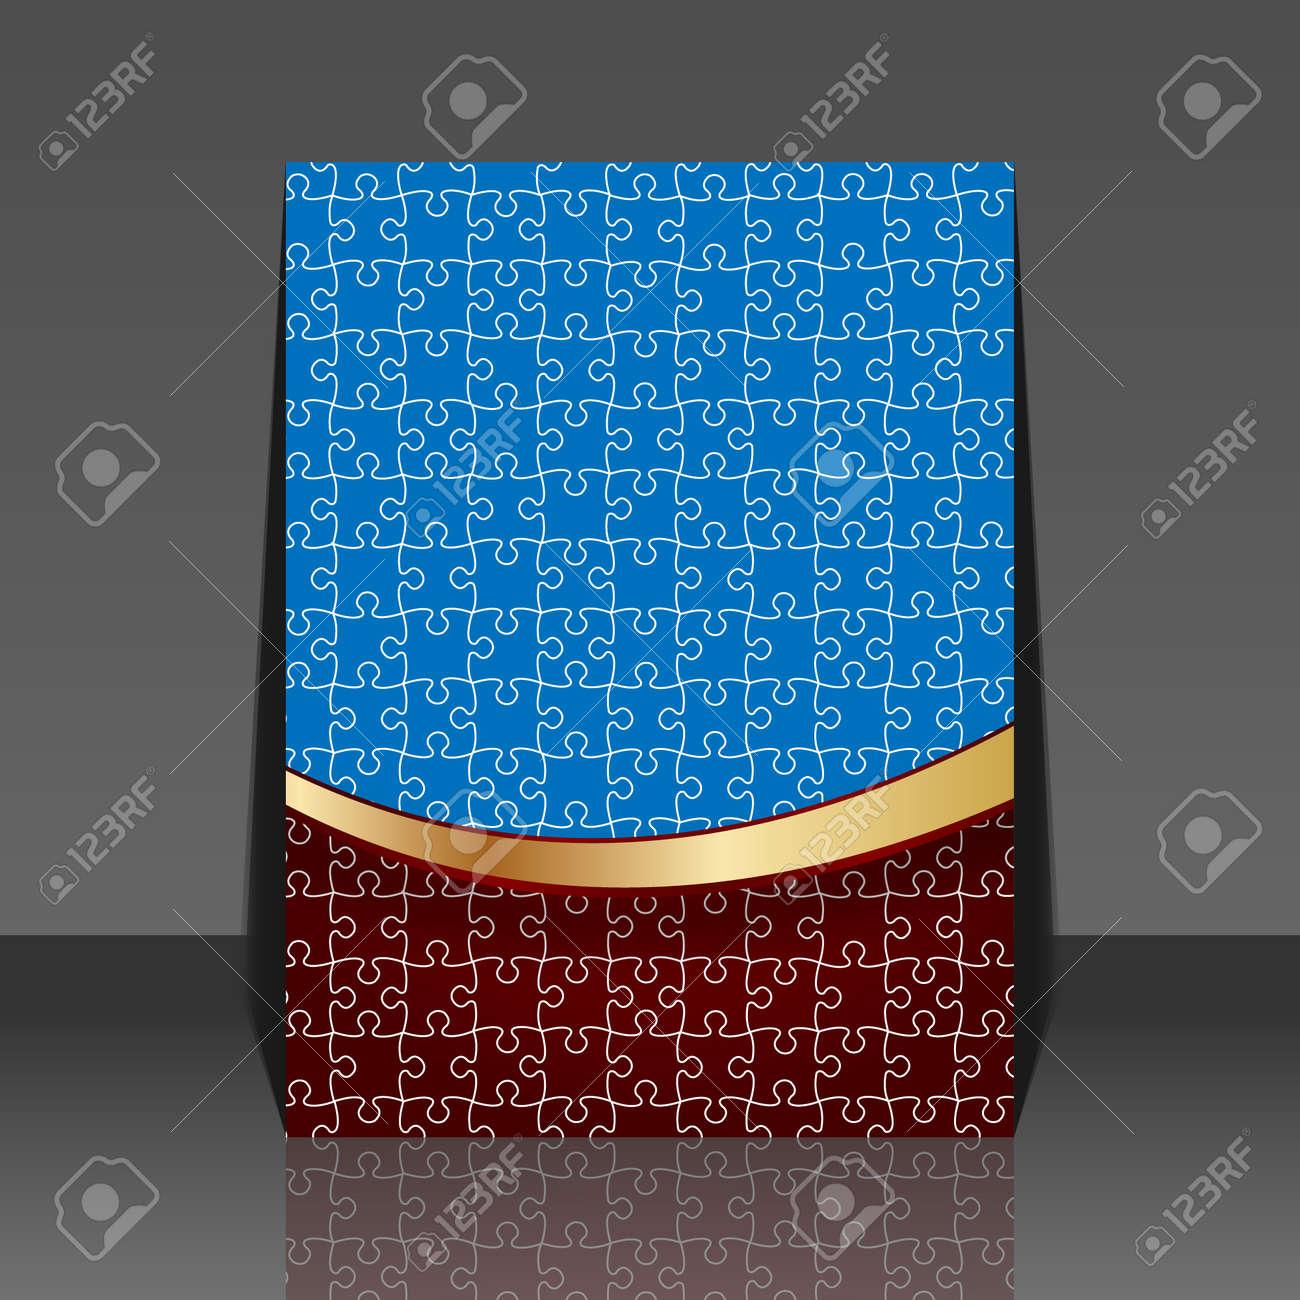 Puzzle pieces design - flyer Stock Vector - 18522477